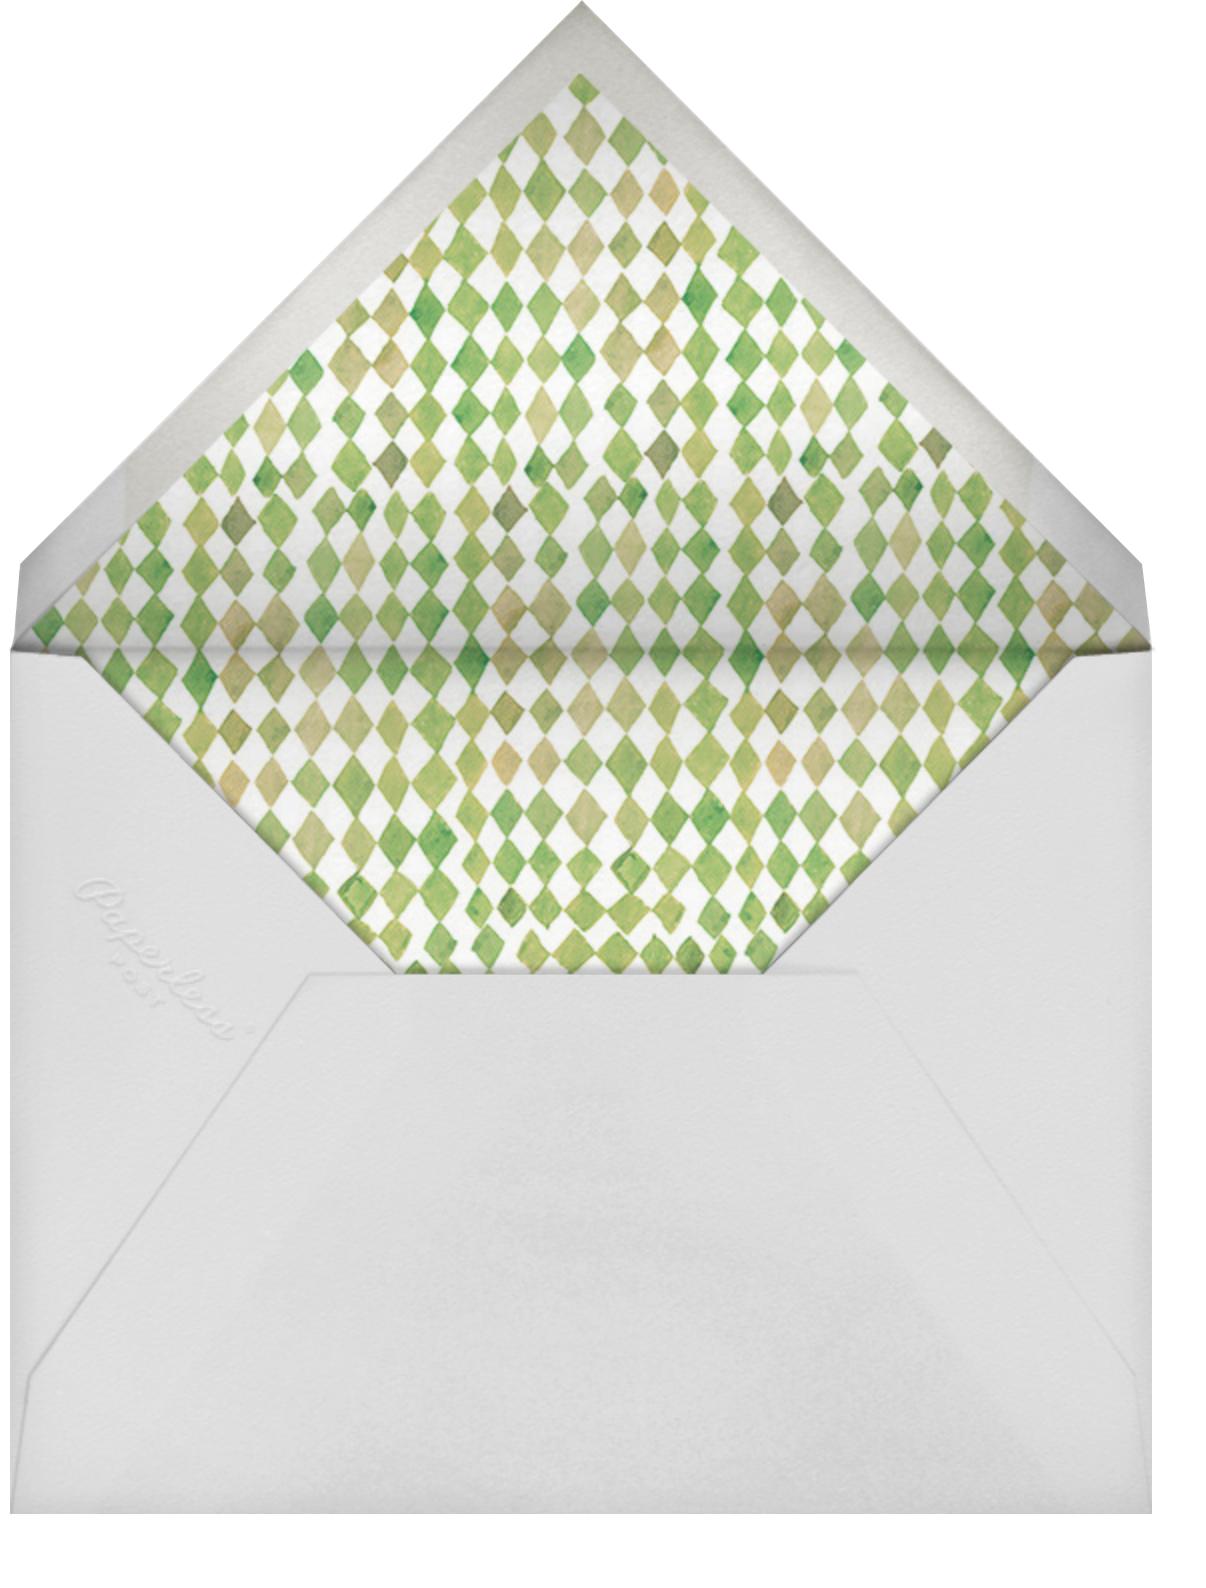 Tiger Leap - Happy Menocal - Kids' birthday - envelope back